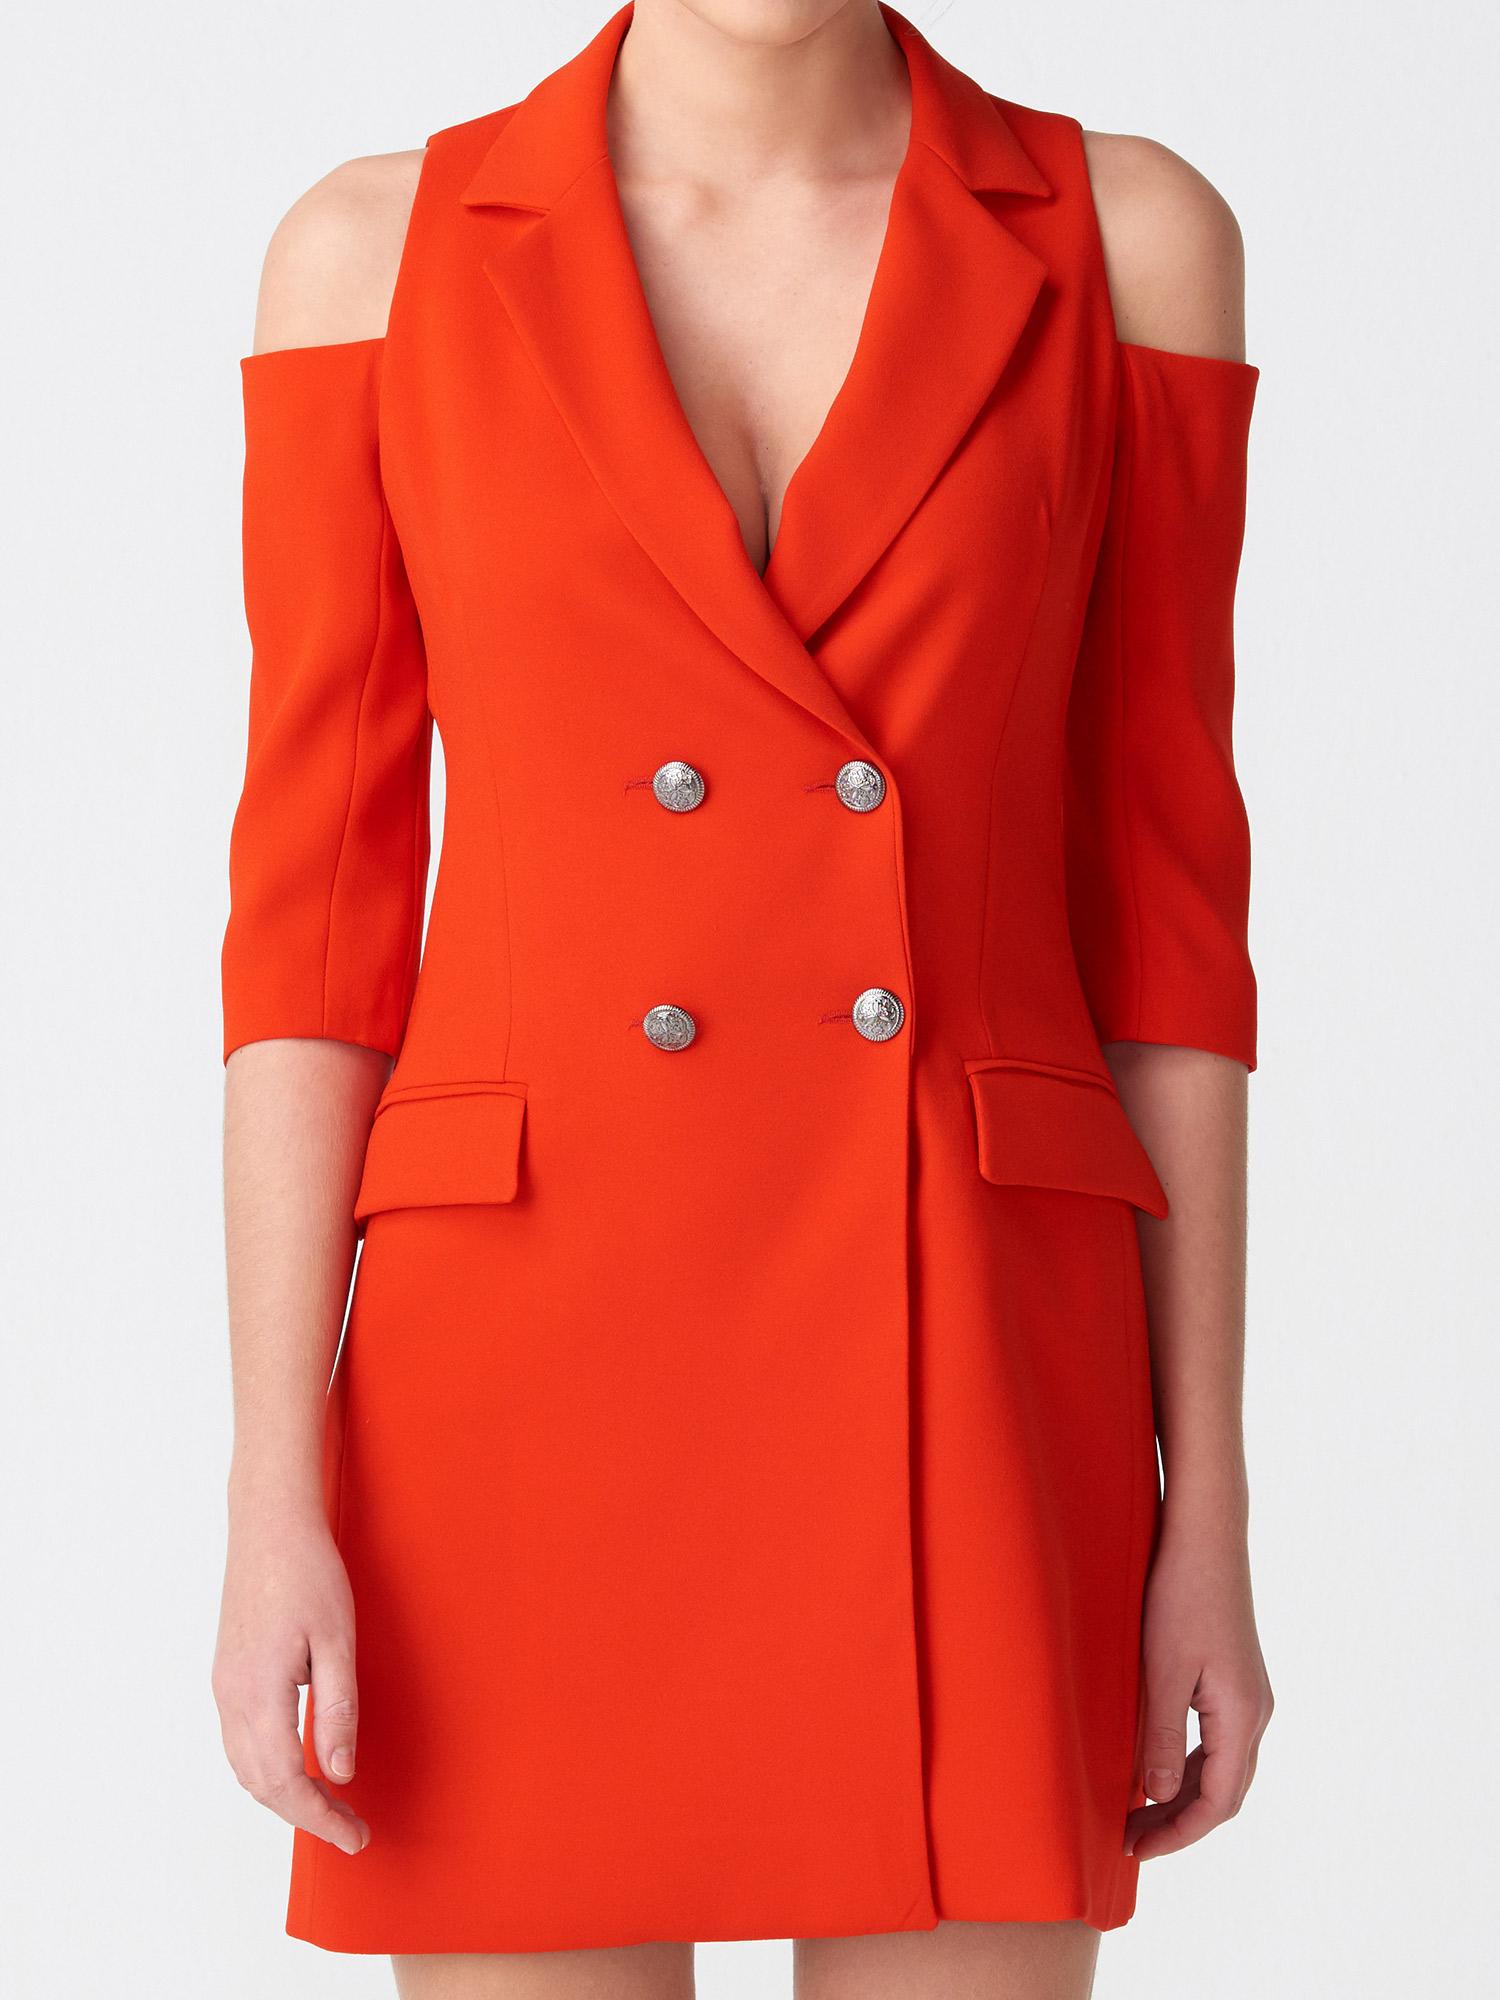 f5a422cb35c89 6709 Omuzu Açık Kruvaze Ceket Elbise-Kırmızı | ELBİSE | DILVIN